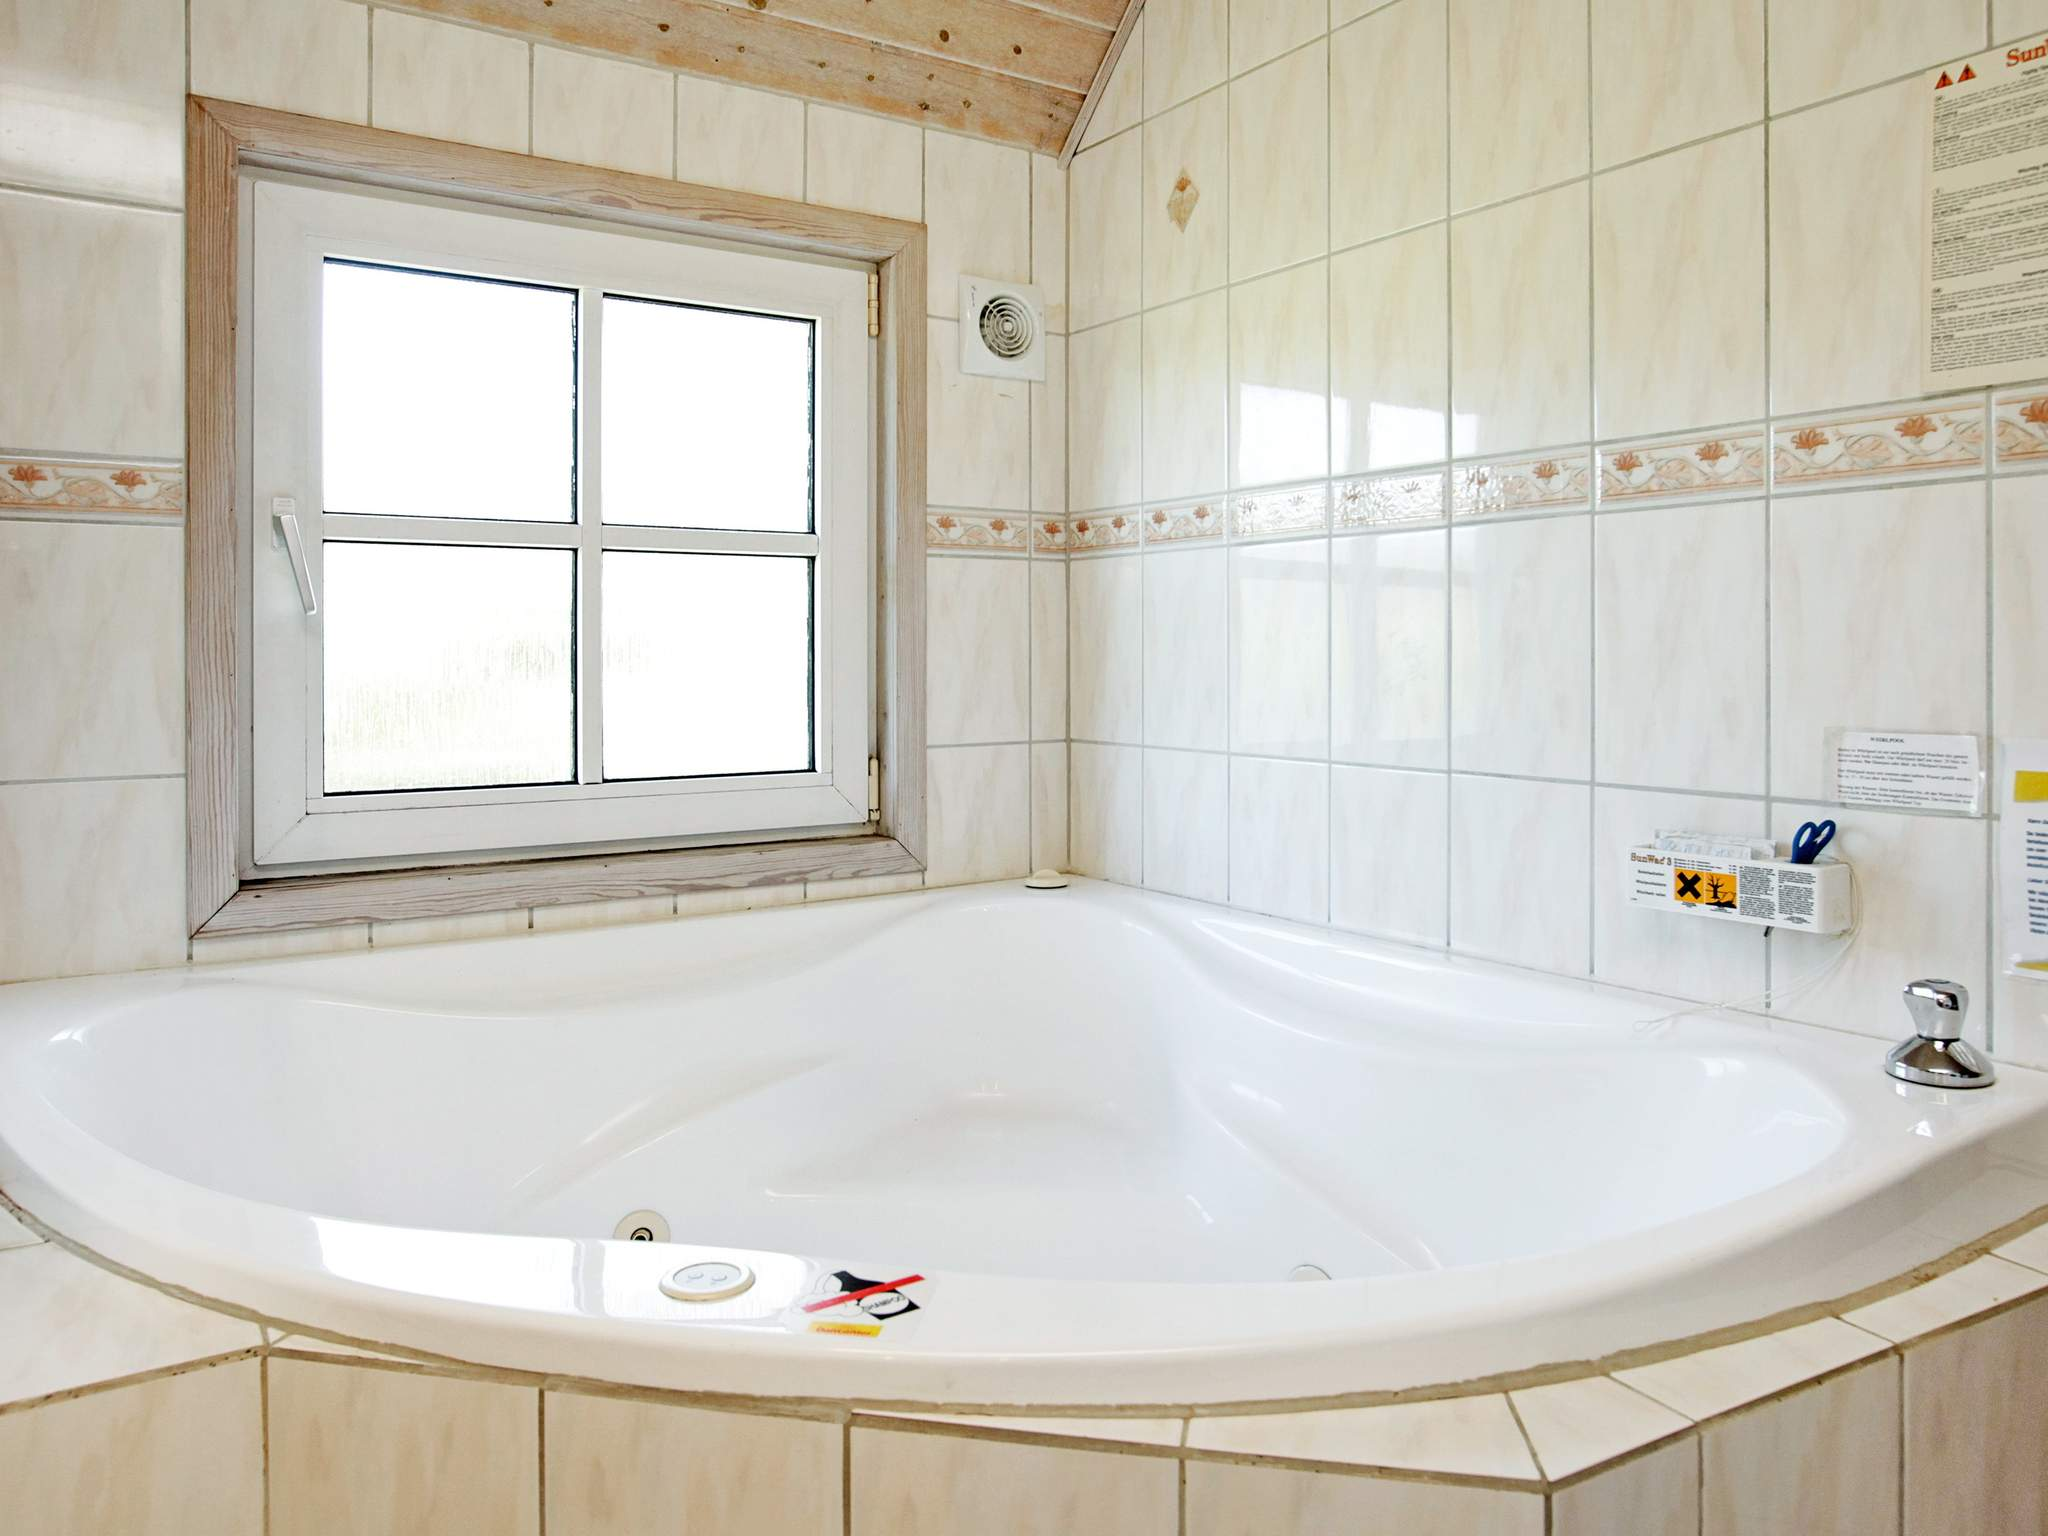 Ferienhaus Blåvand (88463), Blåvand, , Westjütland, Dänemark, Bild 20